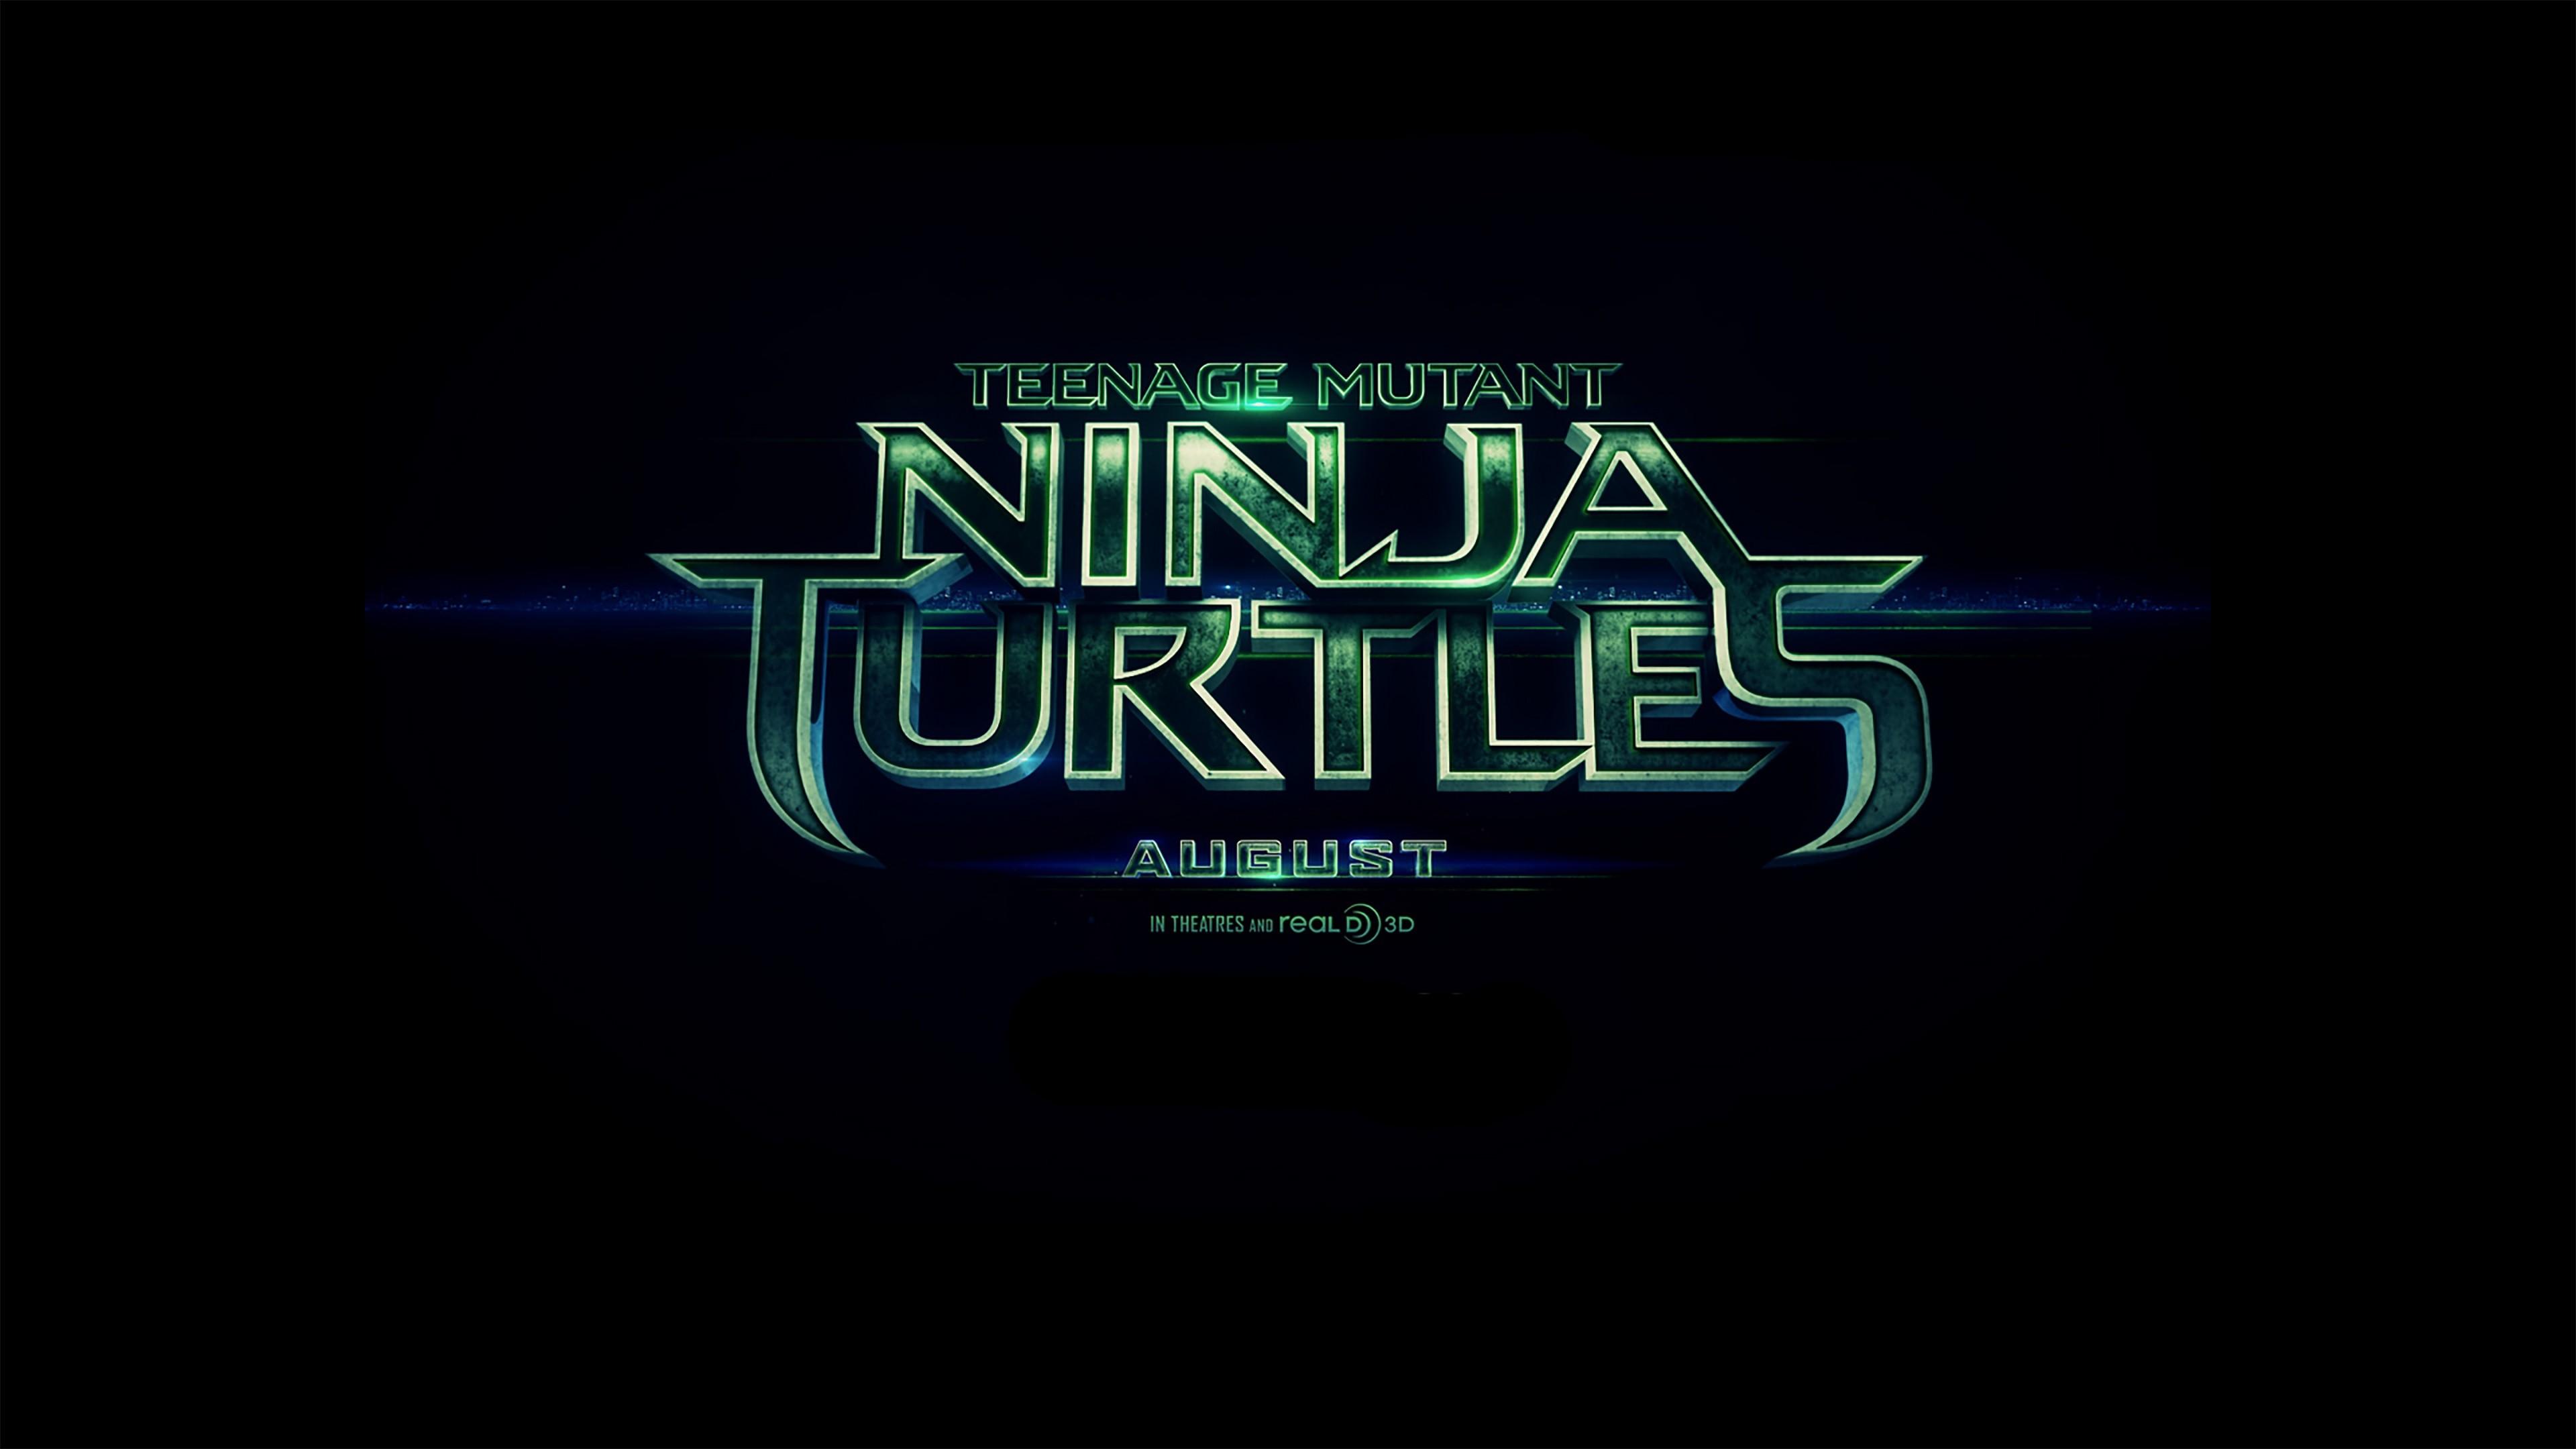 4K HD Wallpaper: Teenage Mutant Ninja Turtles 2014